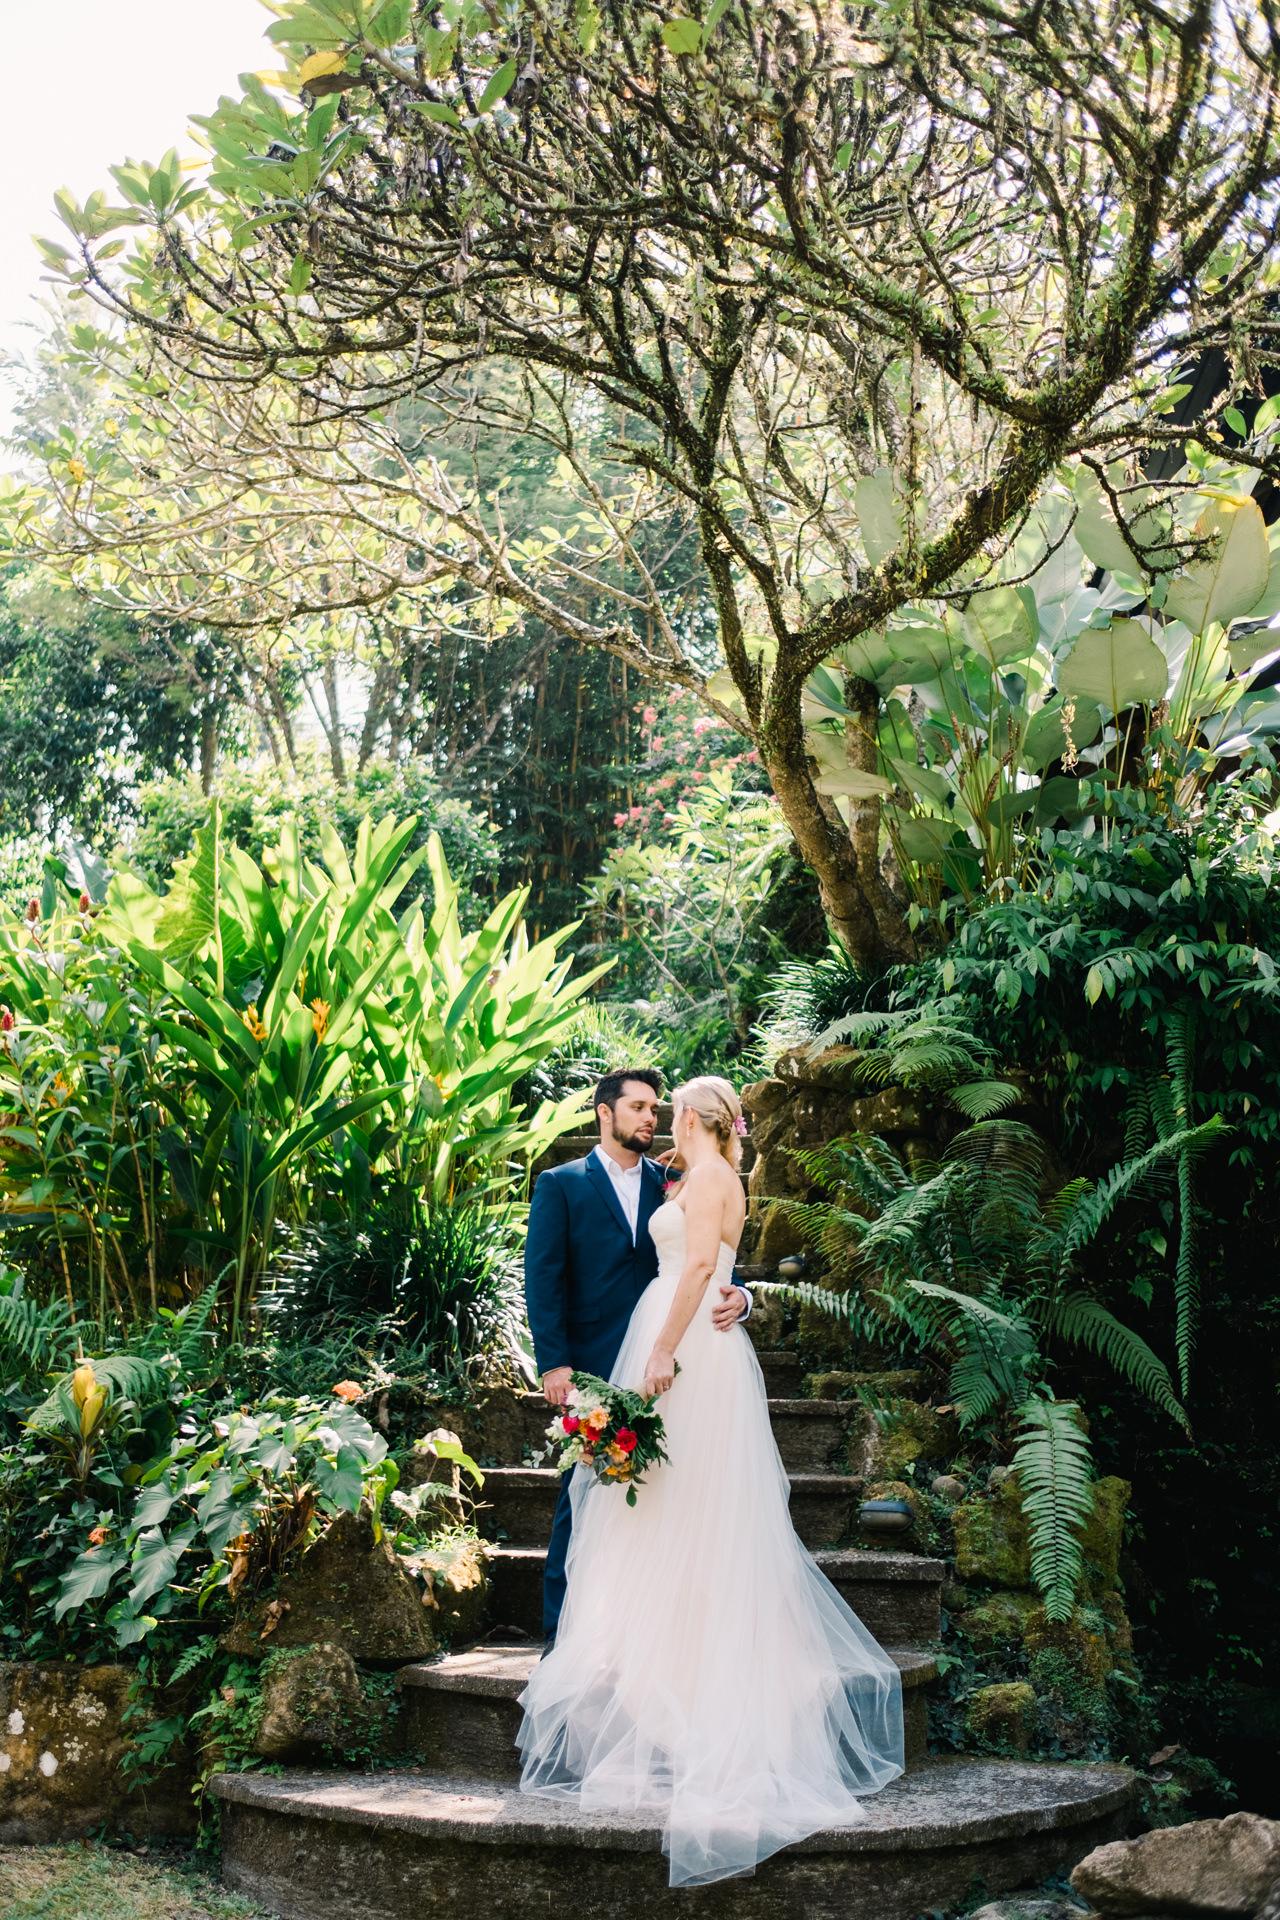 M&D: Greenery Ubud Wedding at Villa Beji Indah 10